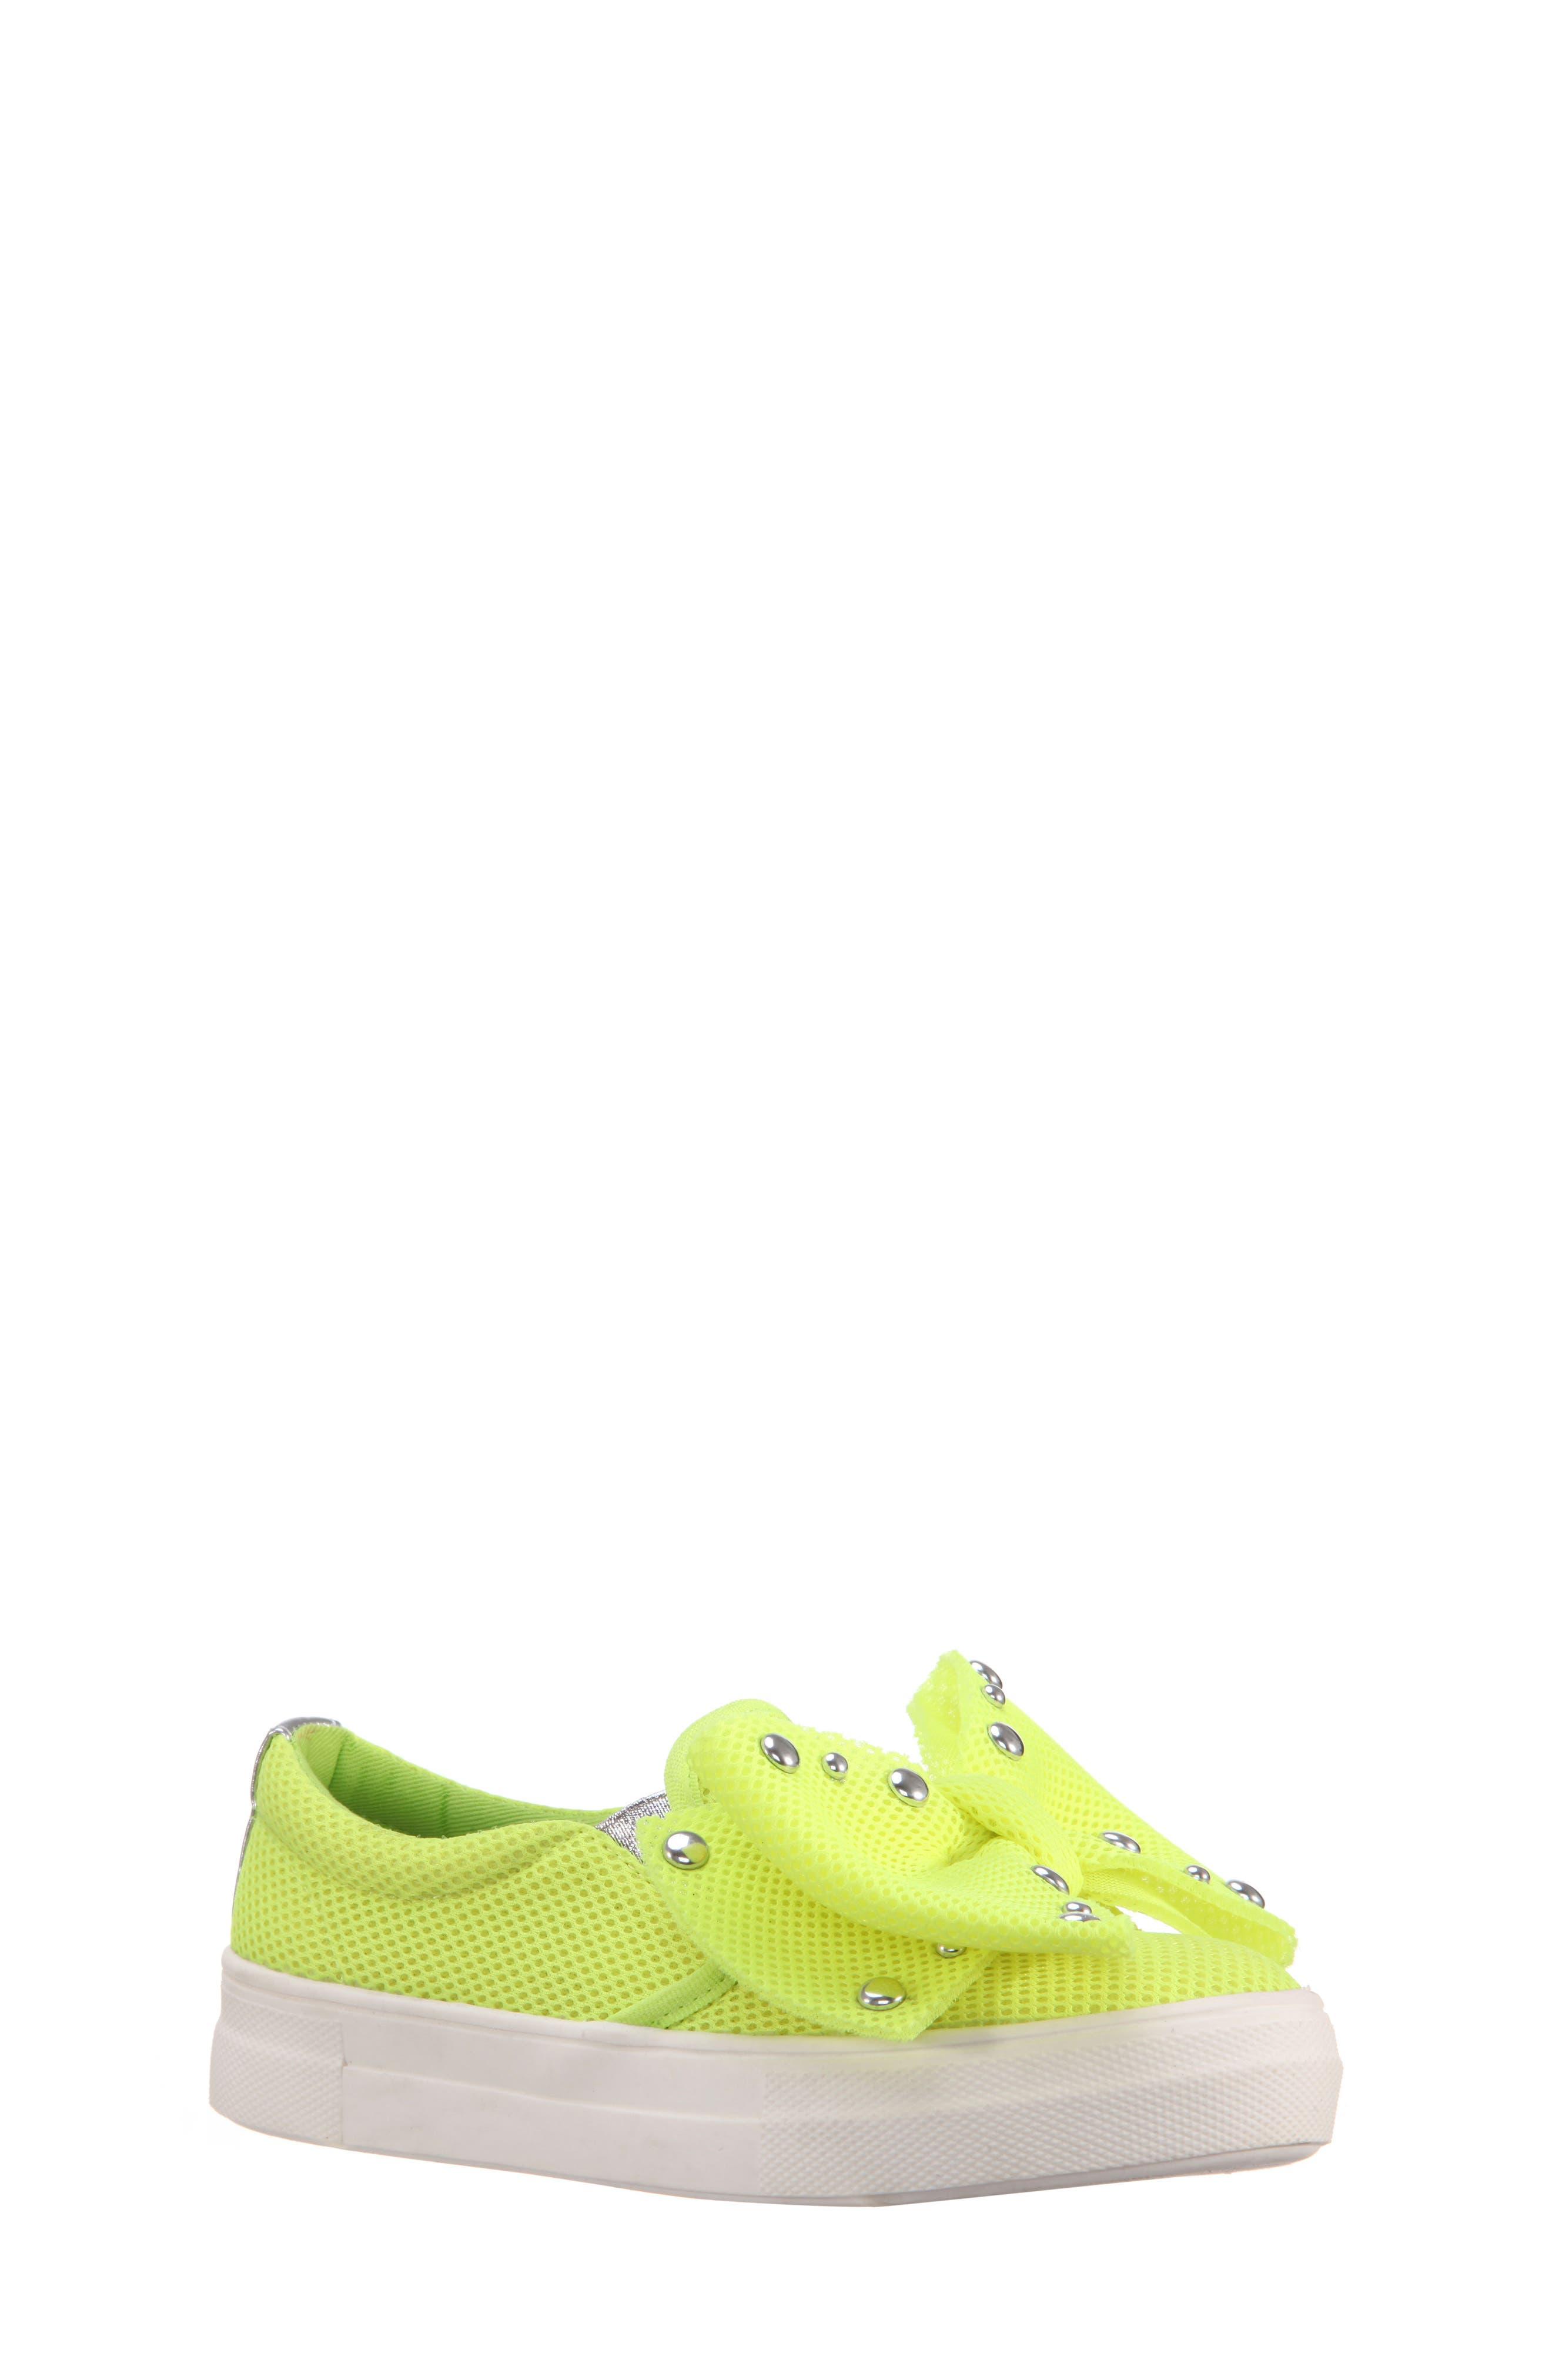 Mary Bow Slip-On Sneaker,                             Main thumbnail 3, color,